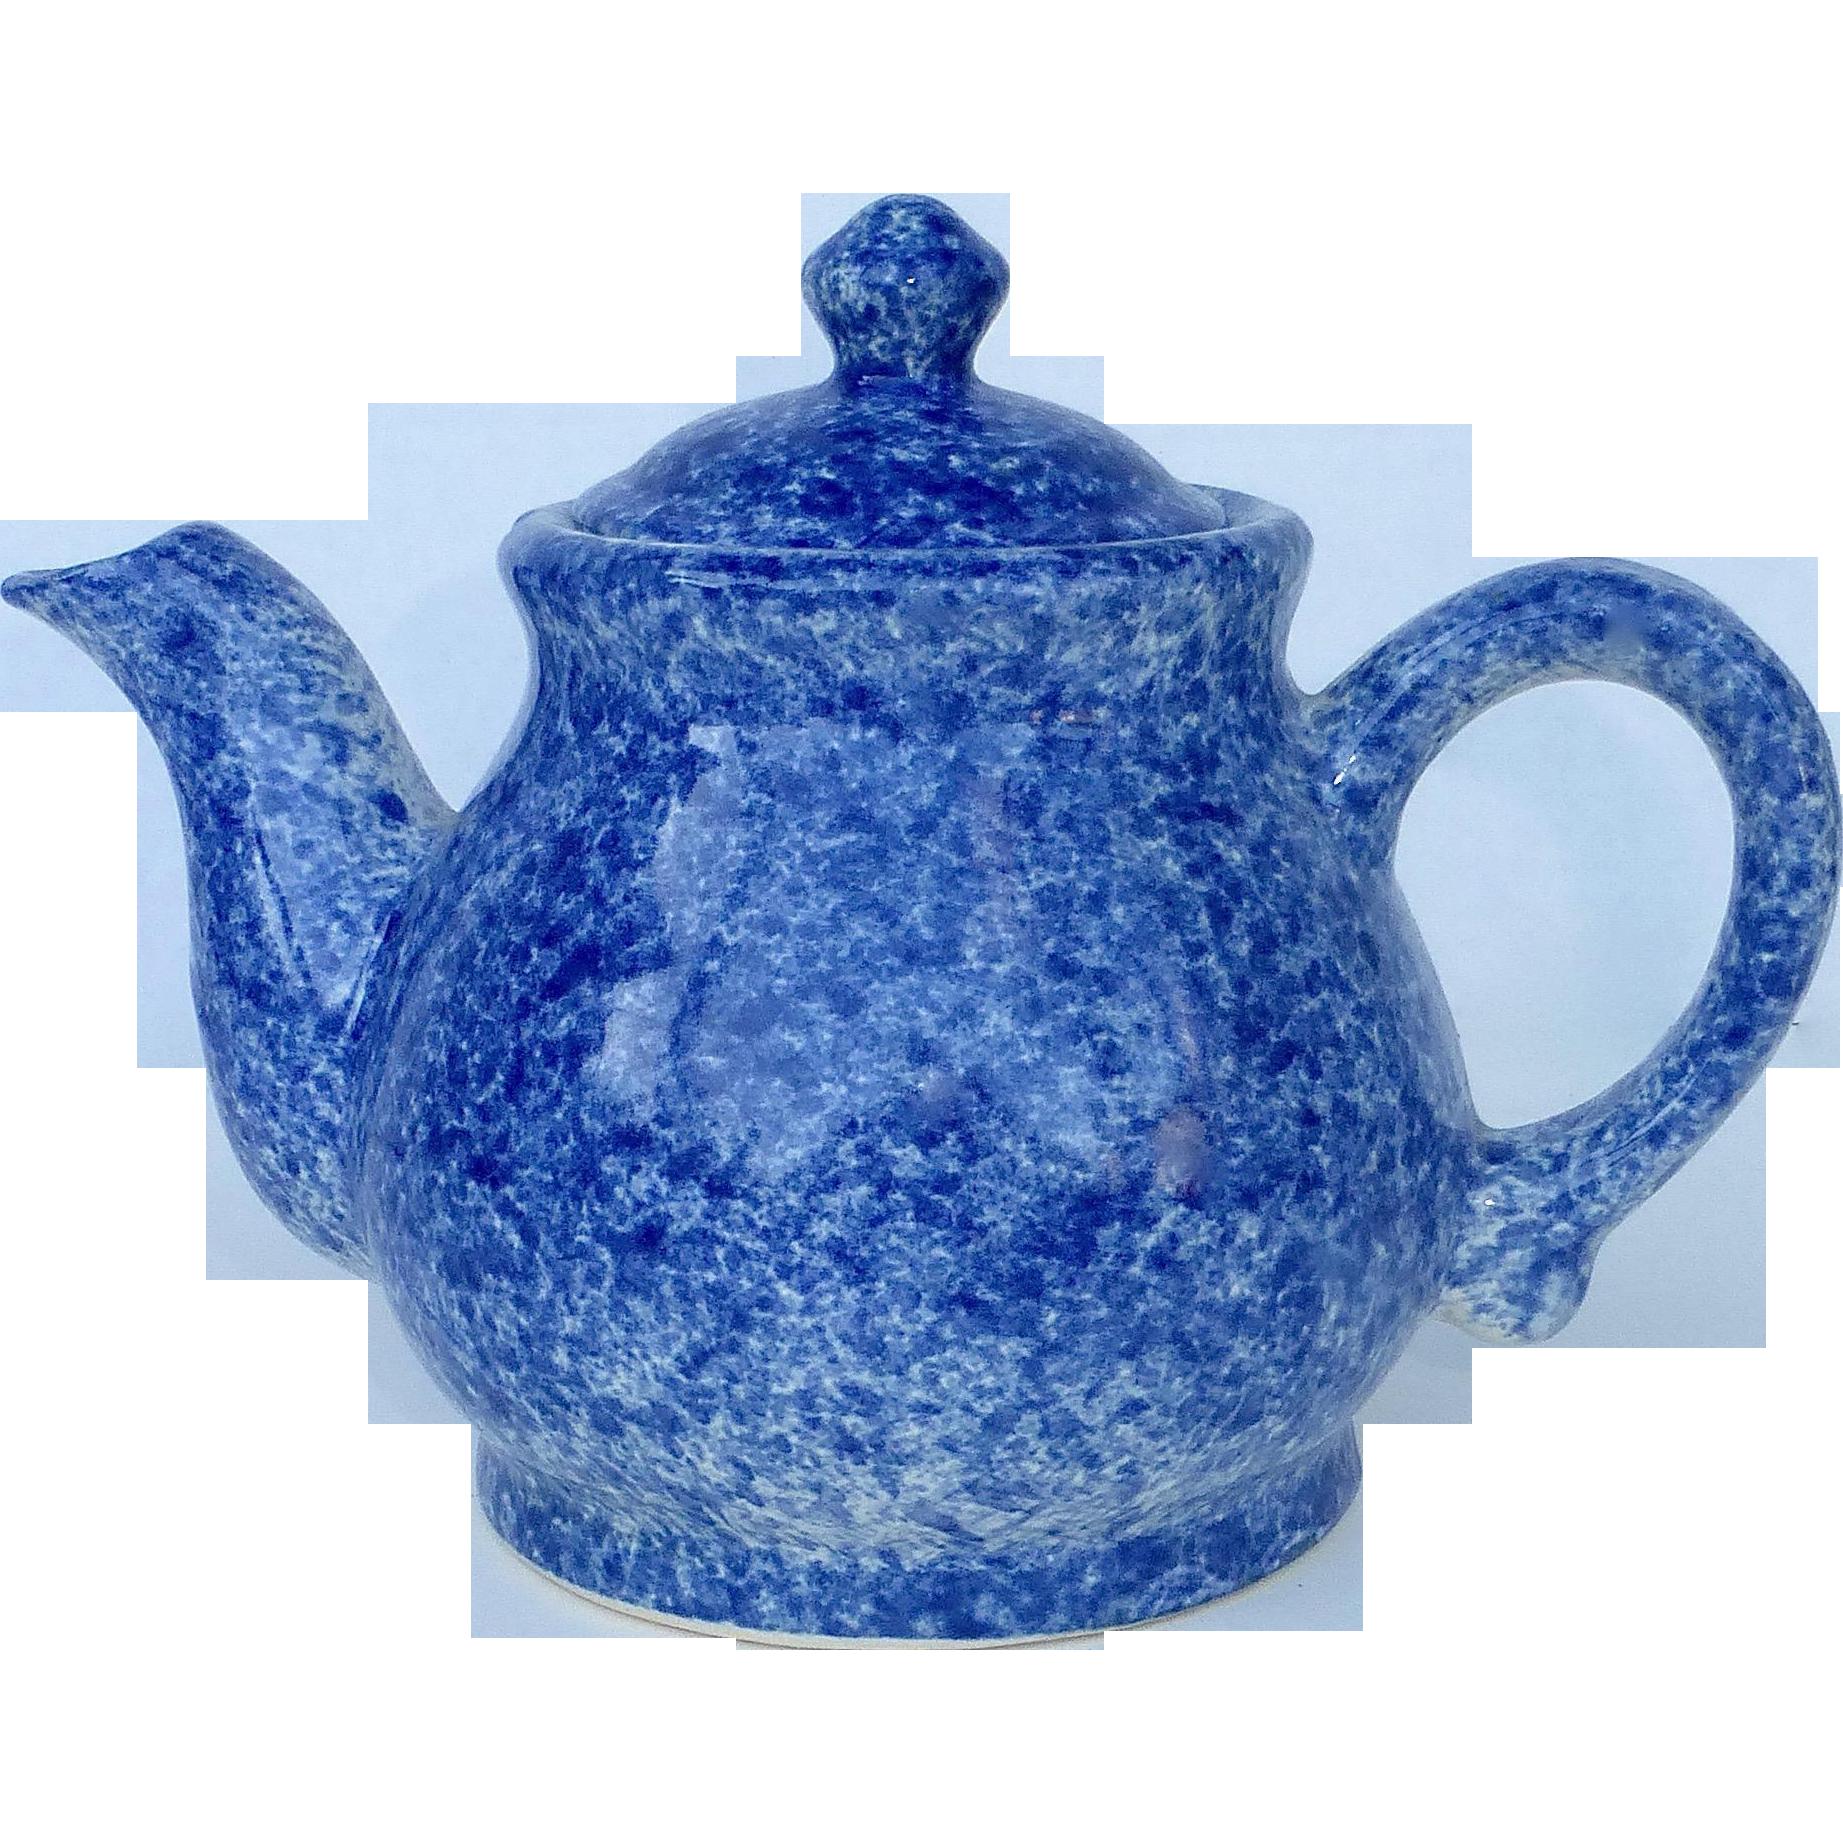 Blue Spongeware Ceramic Teapot Found At Www Rubylane Com Vintagebeginshere Tea Pots Antique Tea Cups Ceramic Teapots